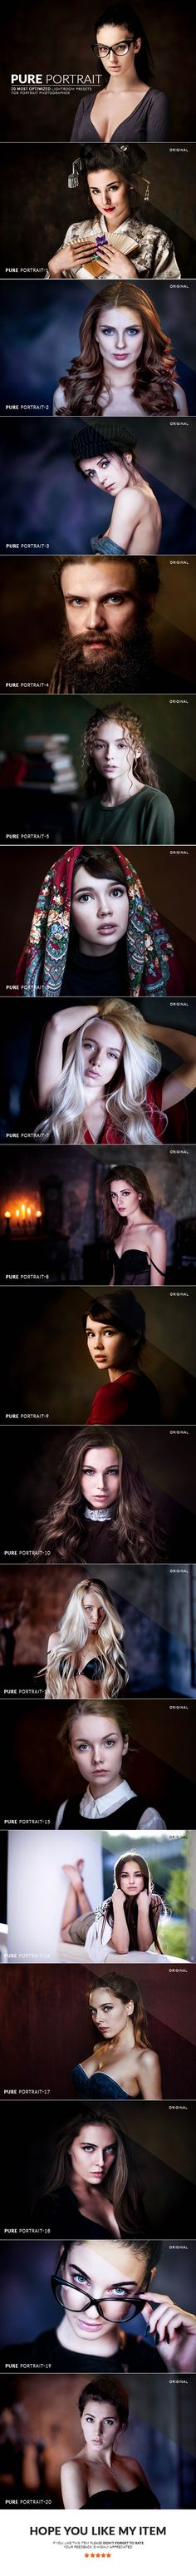 20 Pure Portrait Lightroom Presets. Download here: https://graphicriver.net/item/20-pure-portrait-lightroom-presets/17391687?ref=ksioks